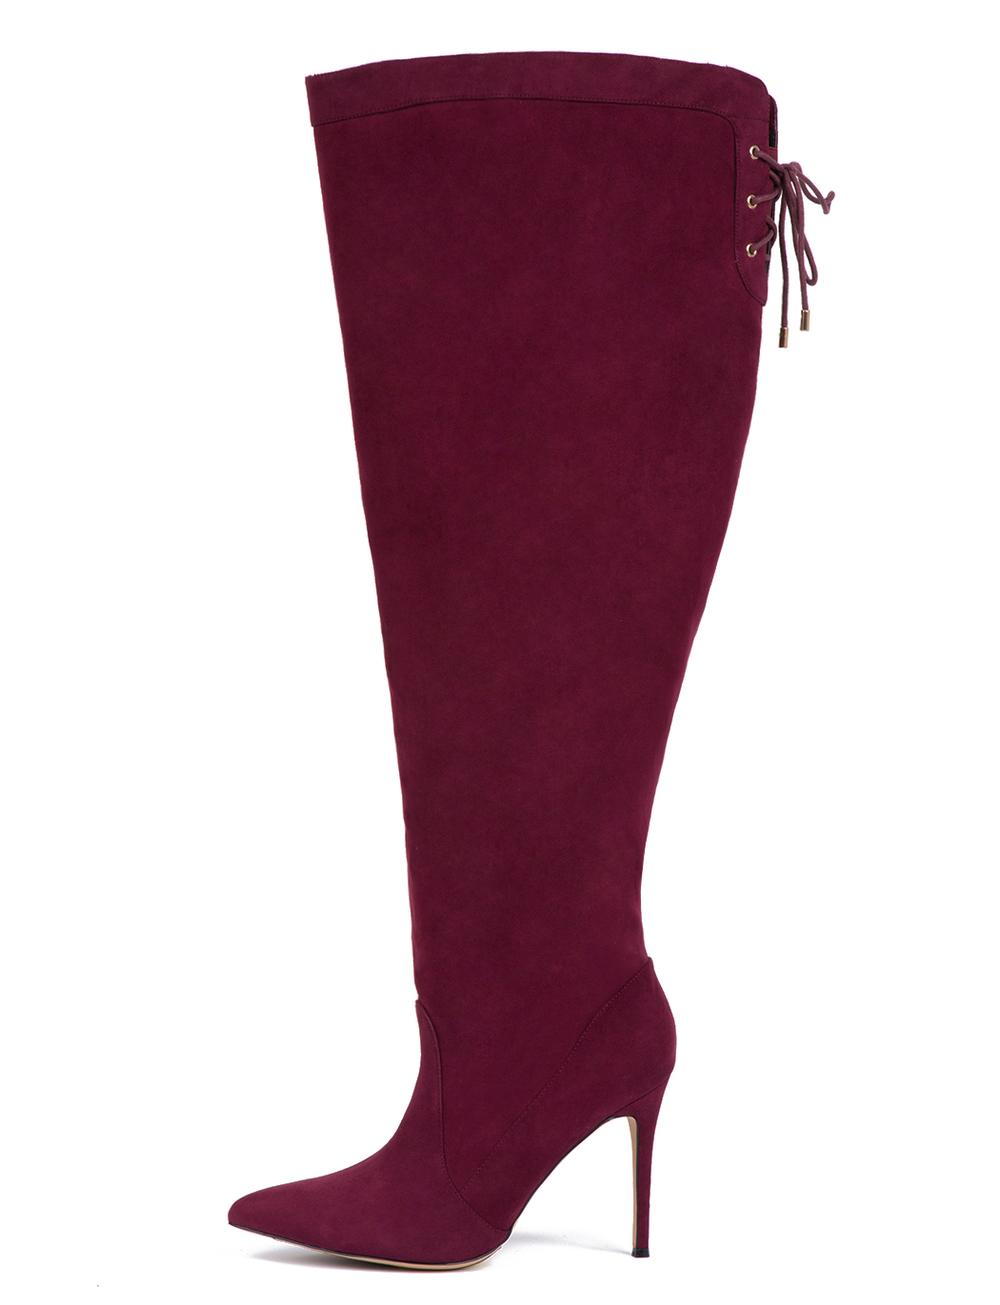 Luella Over-The-Knee-Boot. Eloquii.com. Also comes in Black. $149.90